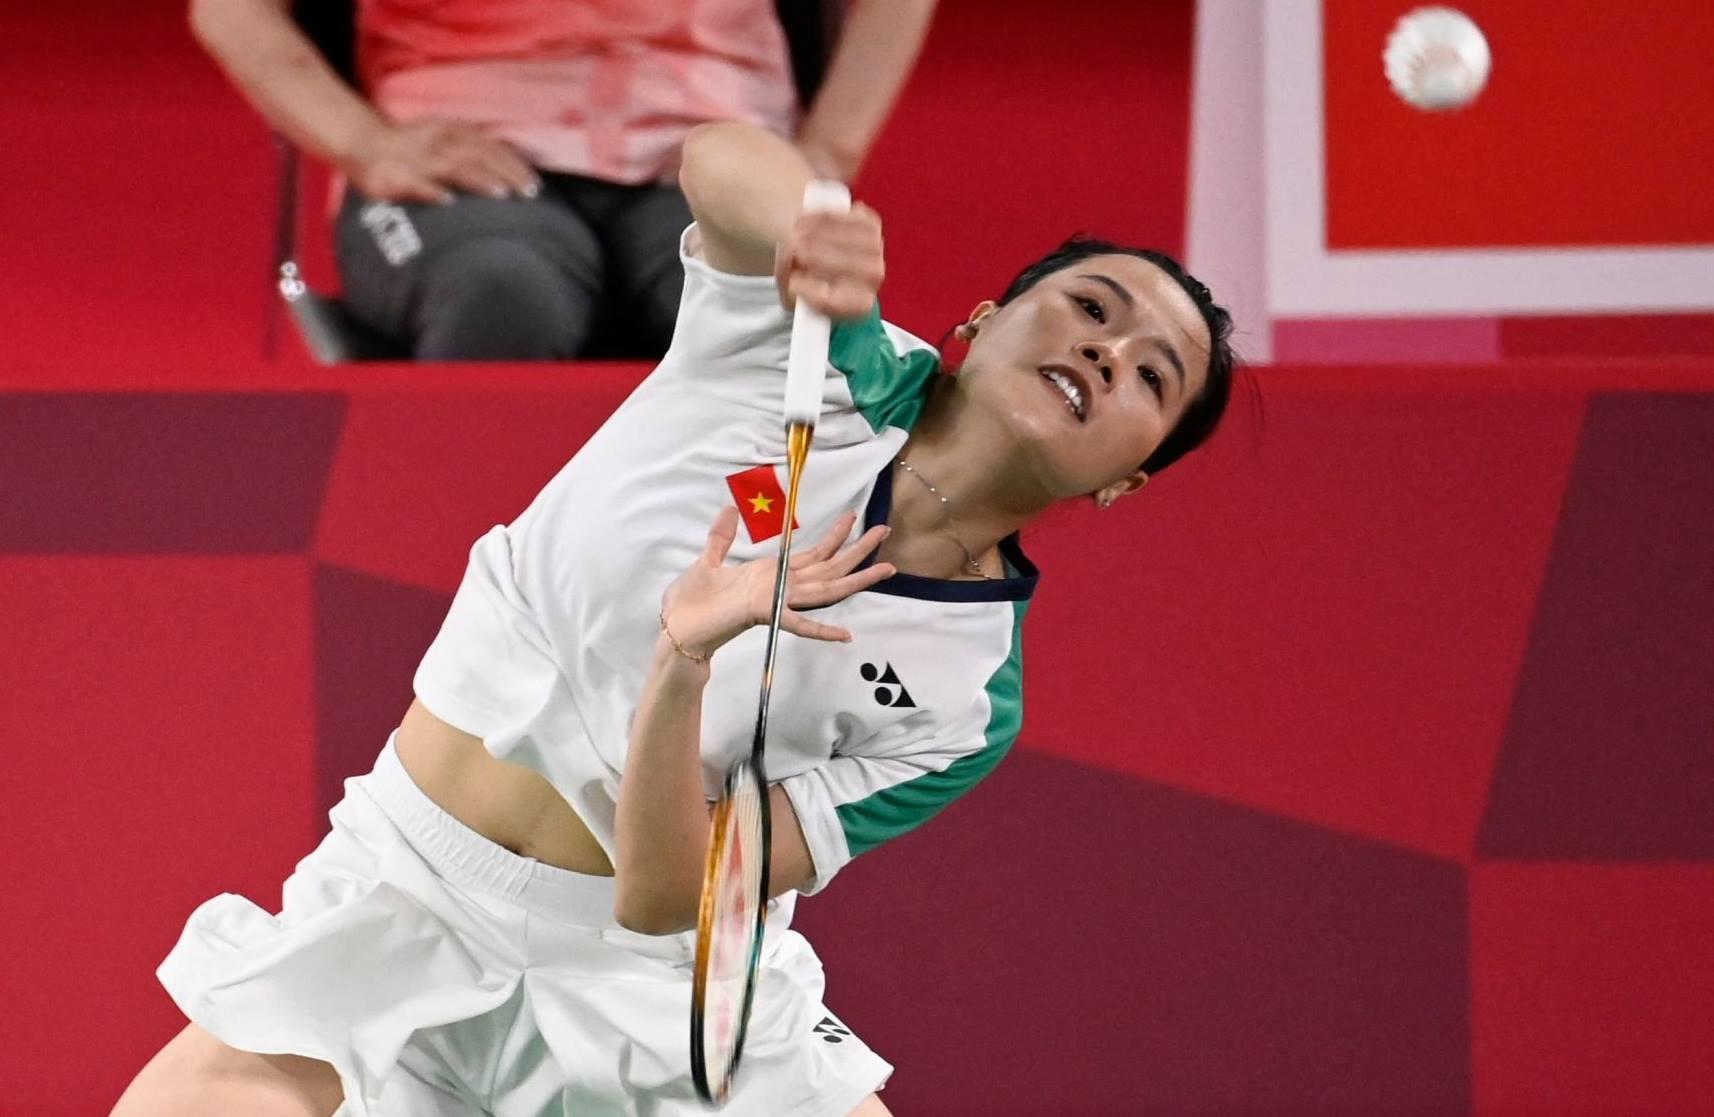 Thuy Linh membuka pertandingan untuk Vietnam pada 28 Juli.